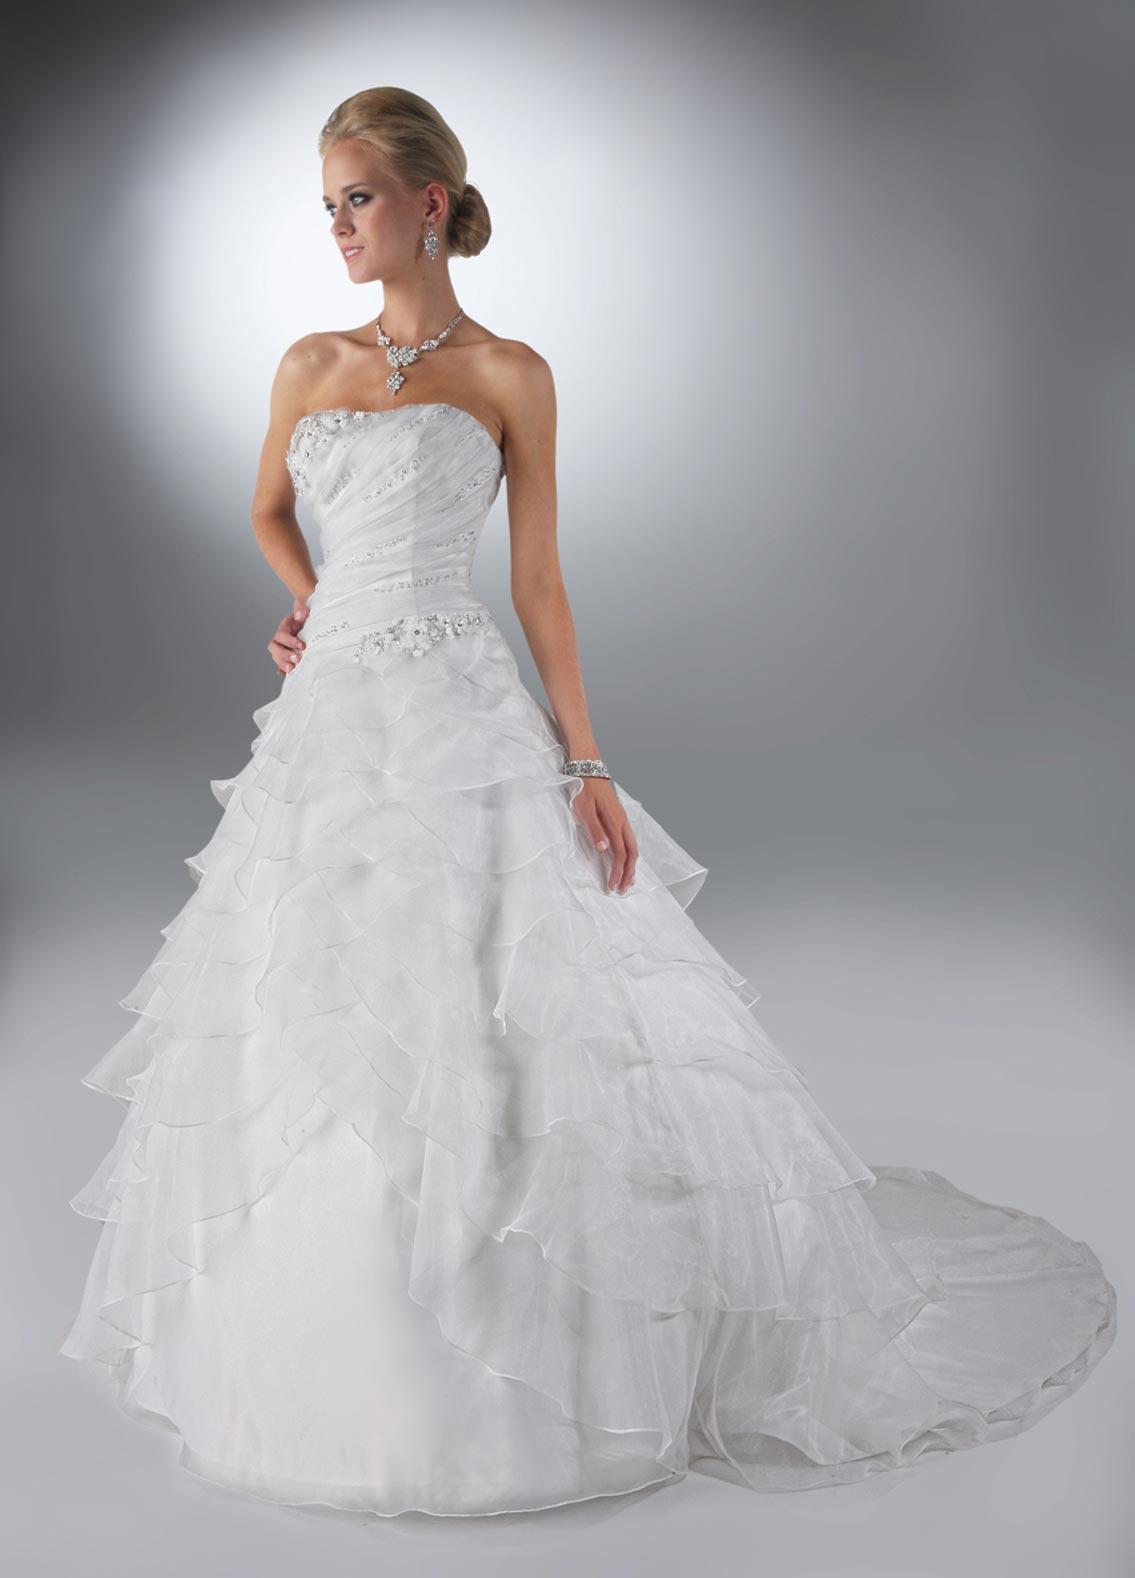 Wedding dresses kalamazoo mi mini bridal for Wedding dresses in kalamazoo mi